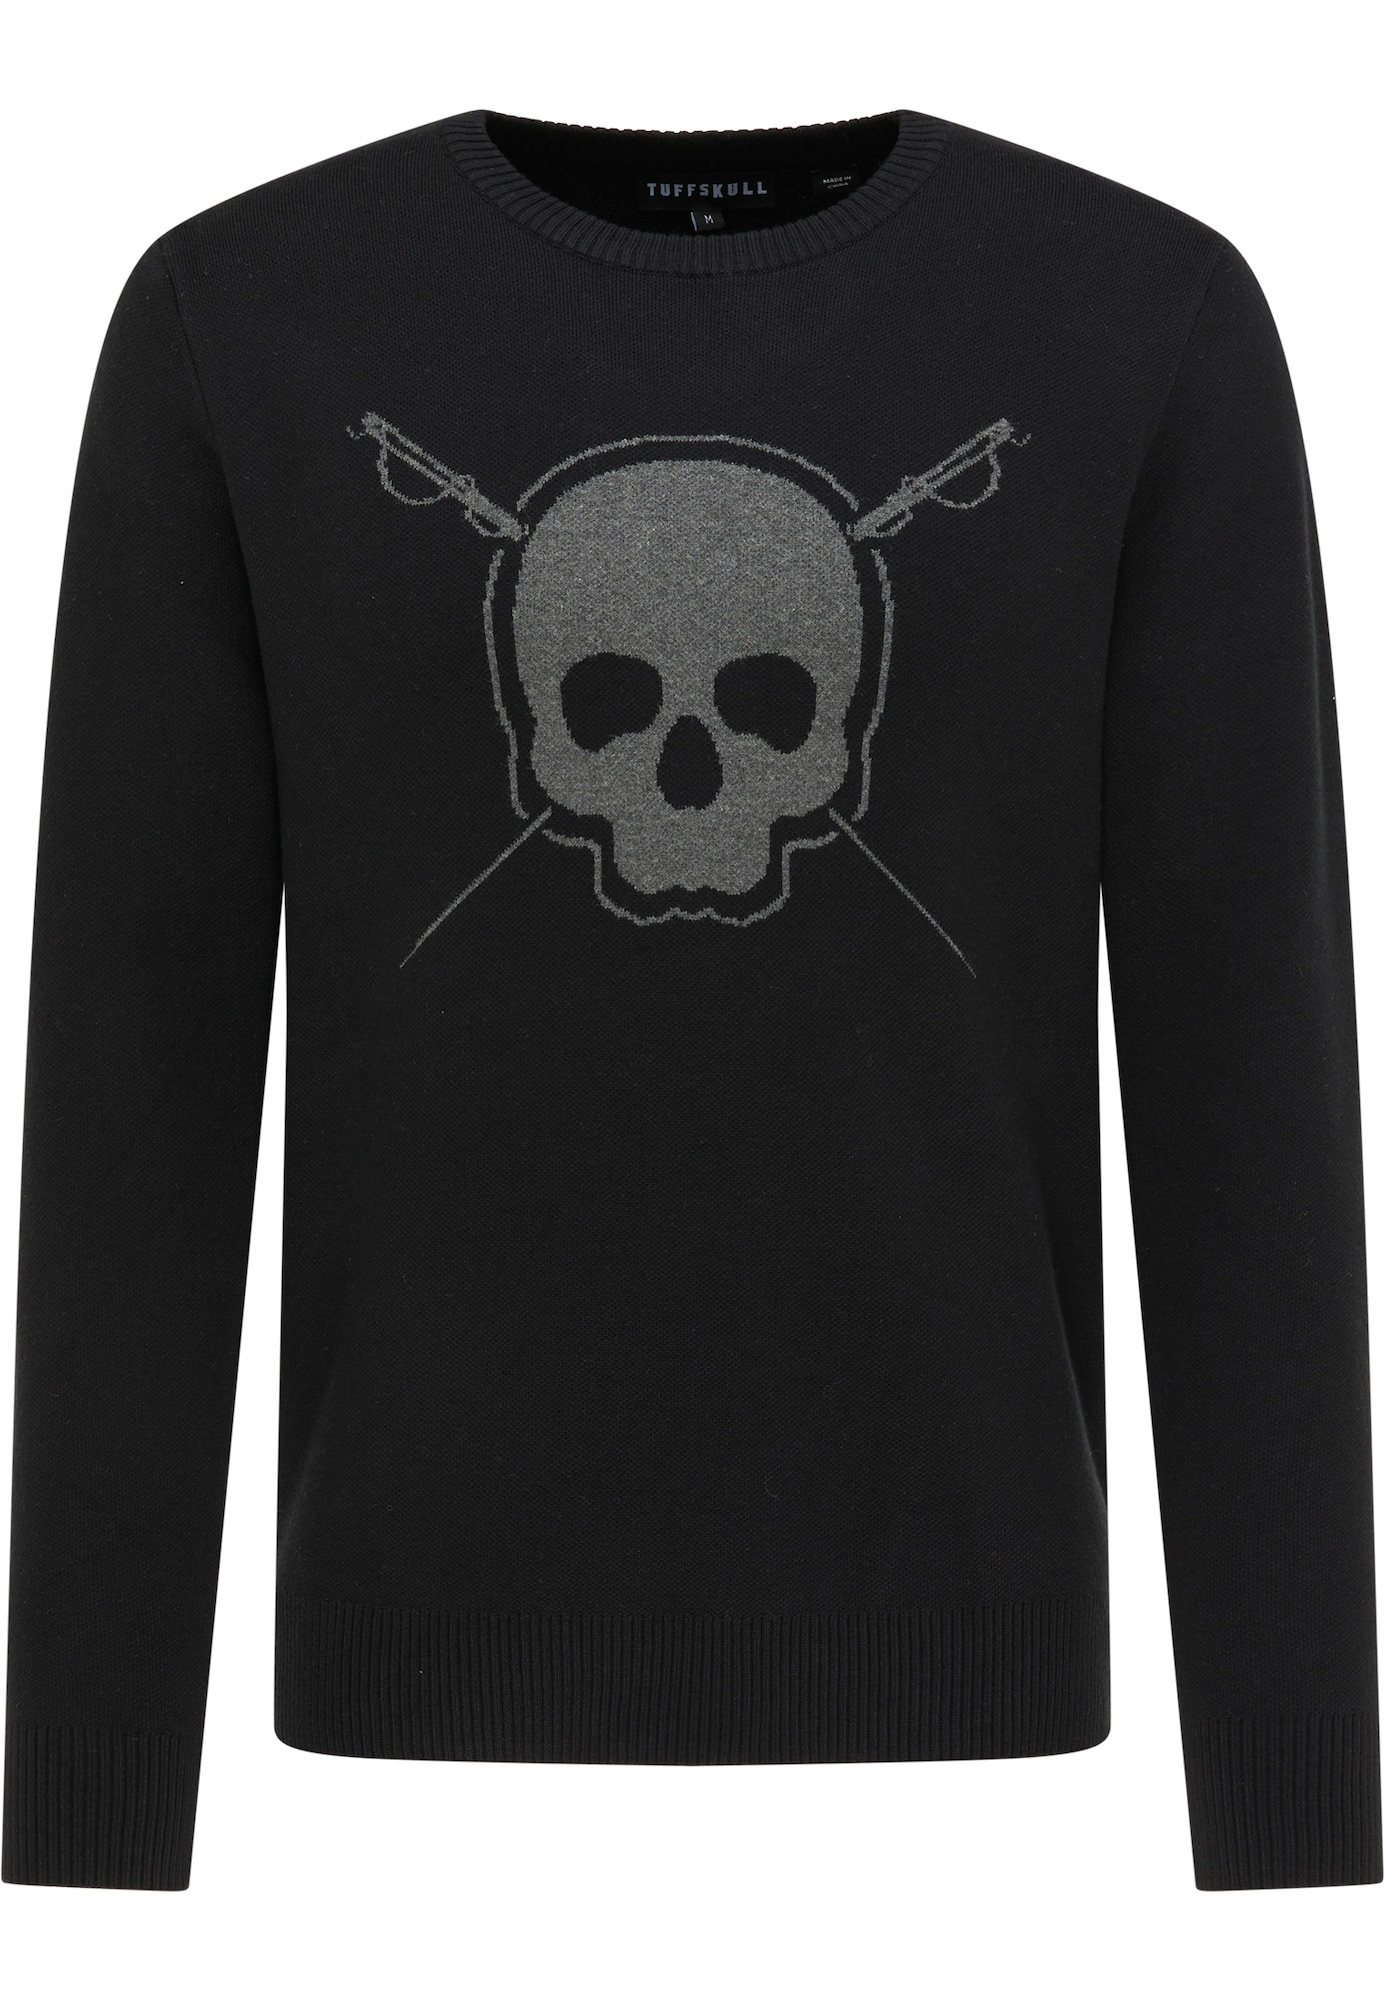 TUFFSKULL Megztinis juoda / tamsiai pilka